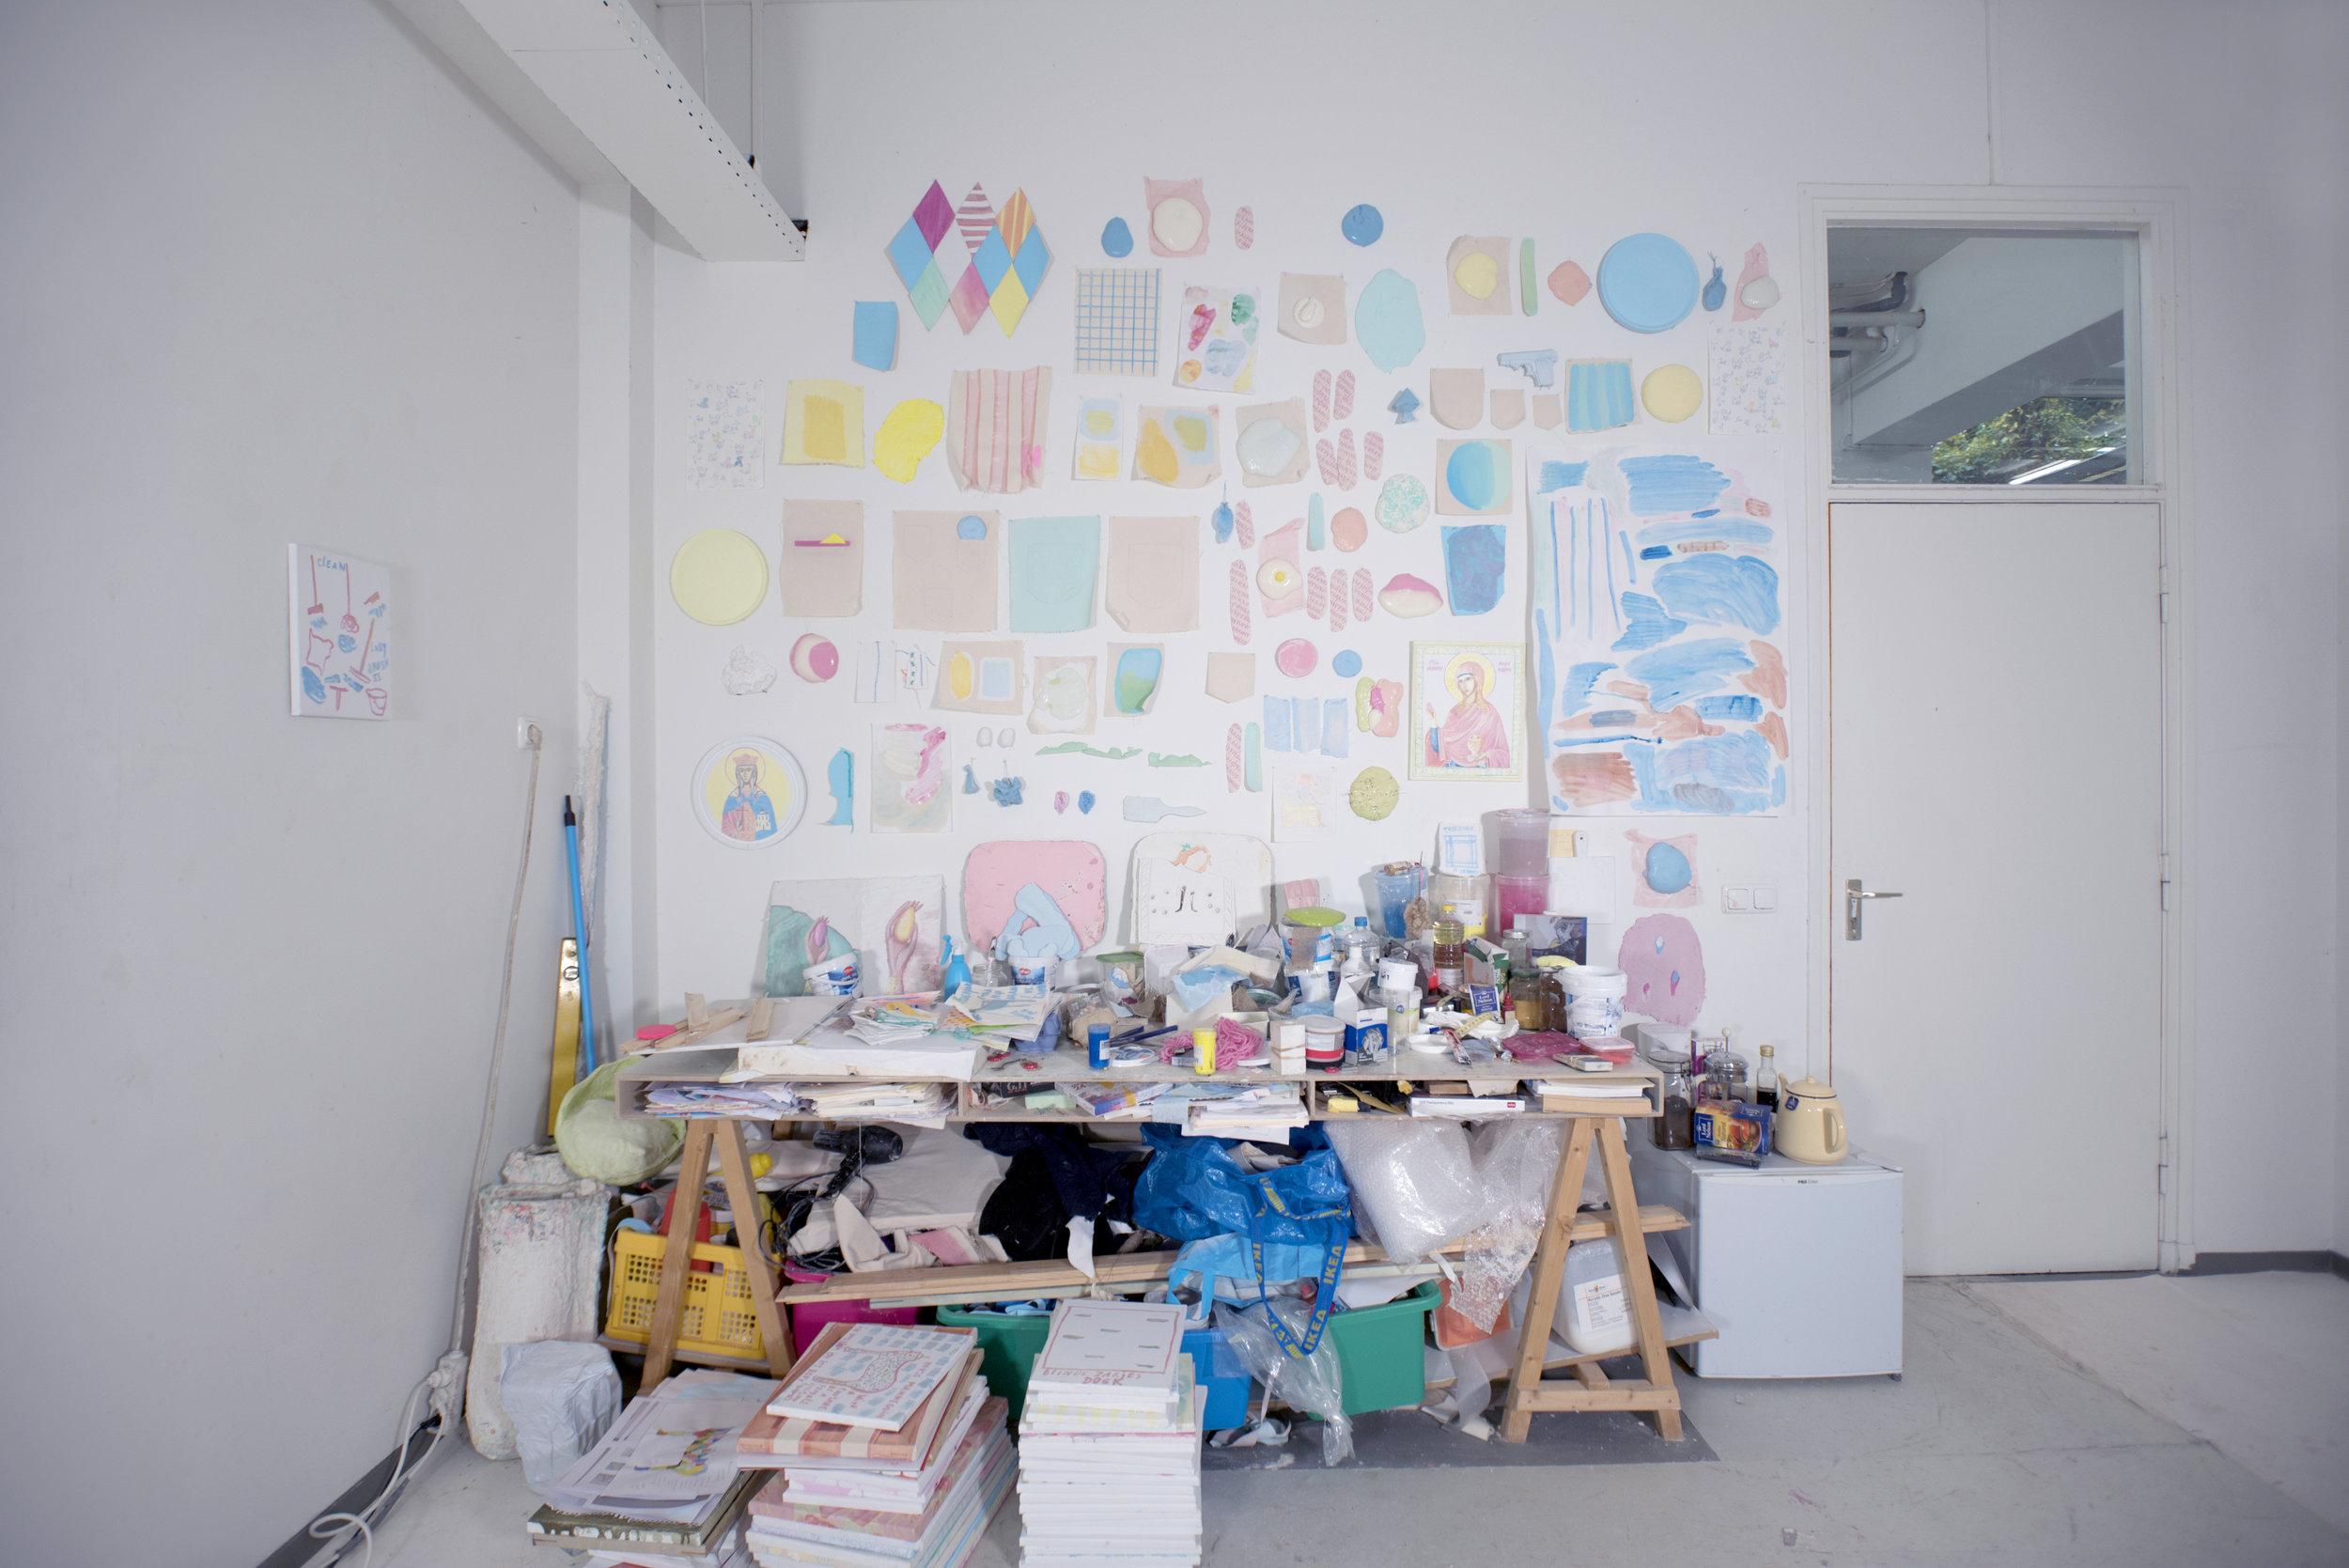 Studio view 2017 - 2018 - Wall with tests, mixed media, Van Eyck Maastricht, 2017